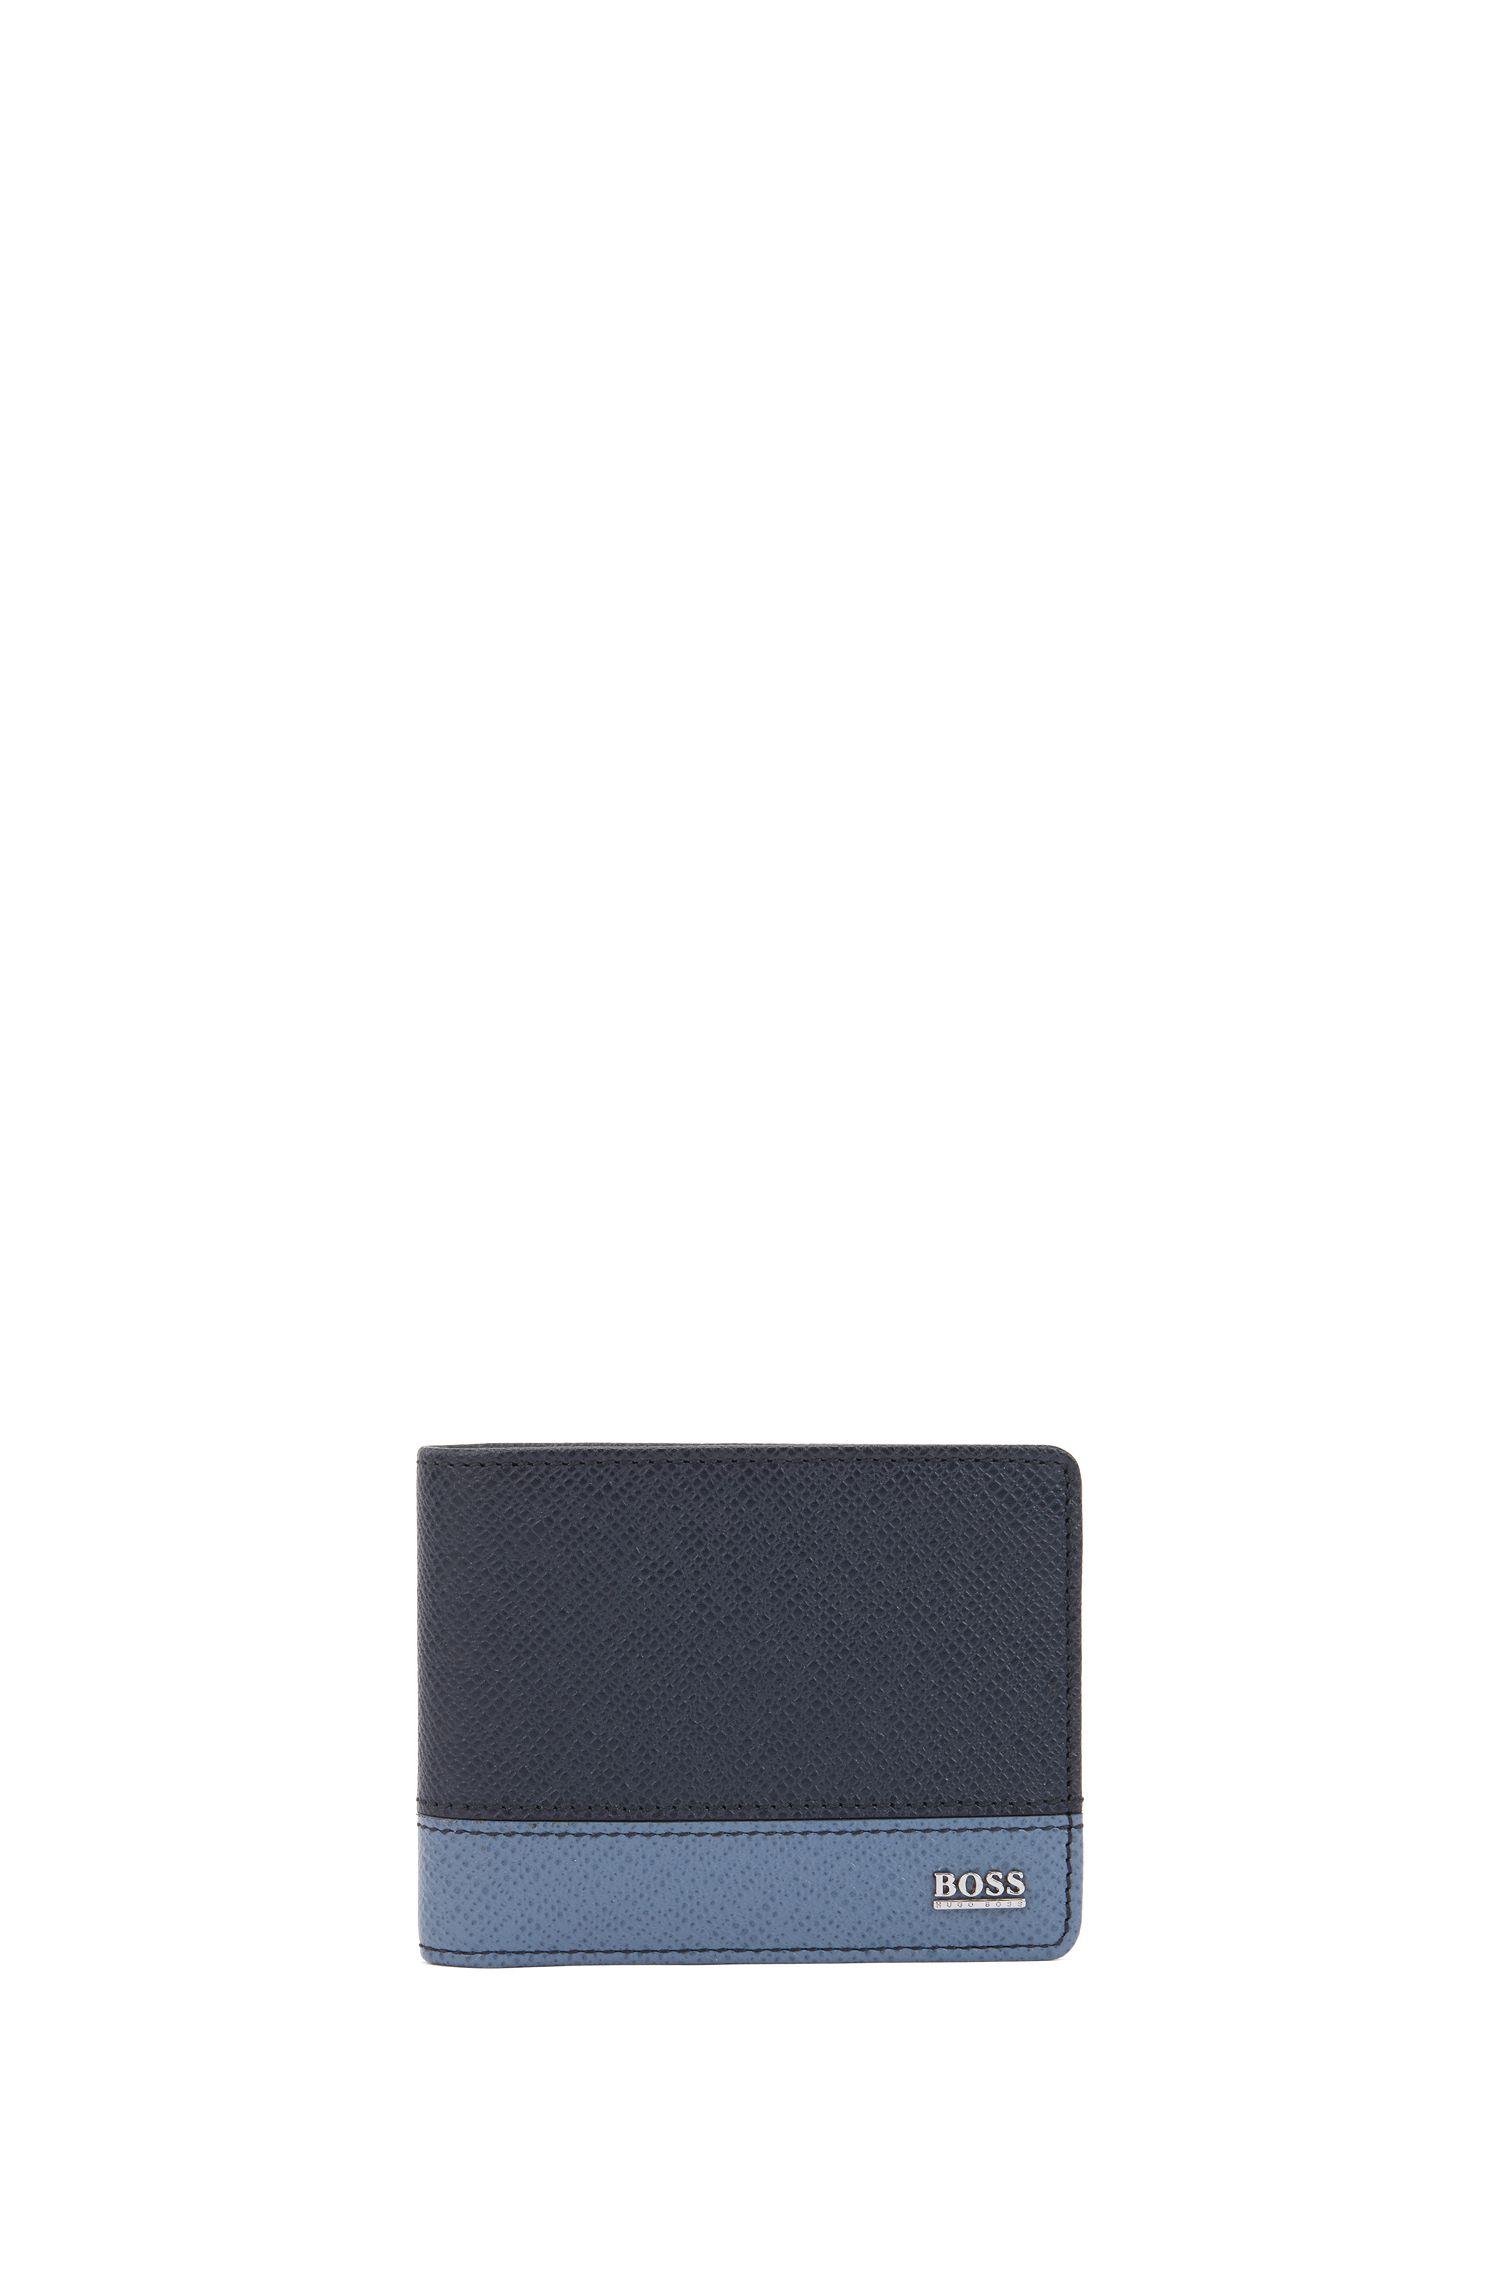 Signature Collection color-block wallet in palmellato leather, Dark Blue